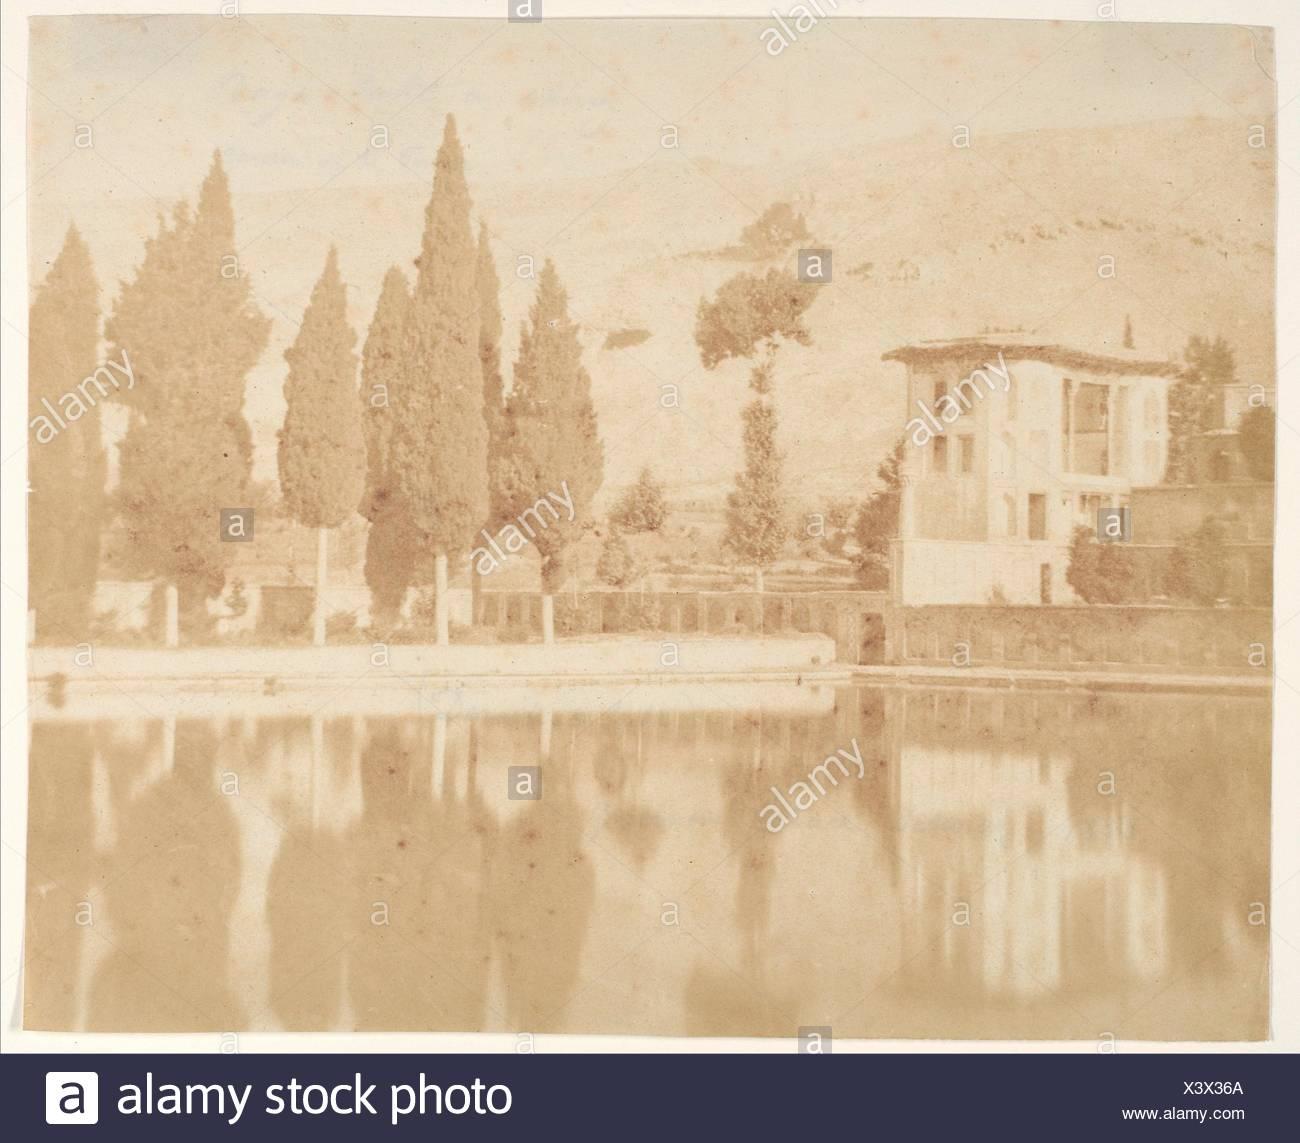 Bagh-takt a chiraz. Artist: Luigi Pesce (Italian, 1818-1891); Date: 1858; Medium: Salted paper print from paper negative; Classification: - Stock Image